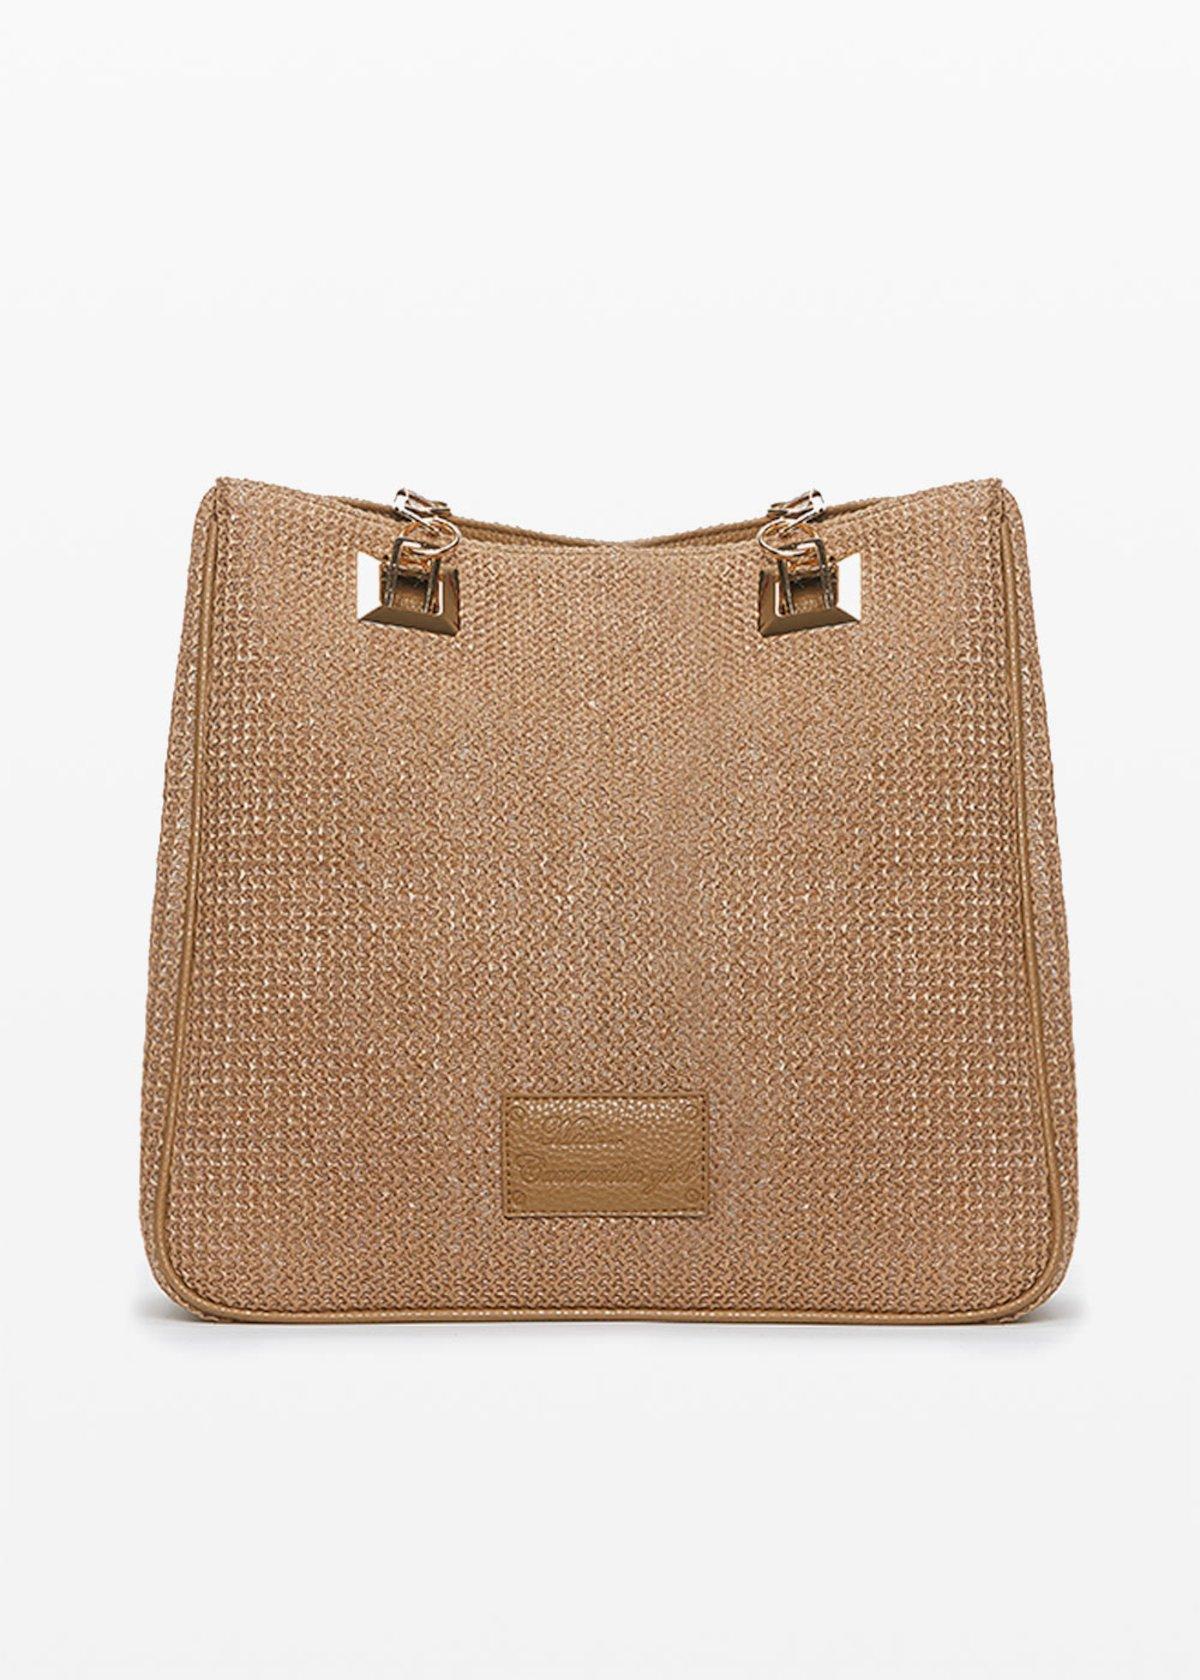 Blindas raffia fabric bag